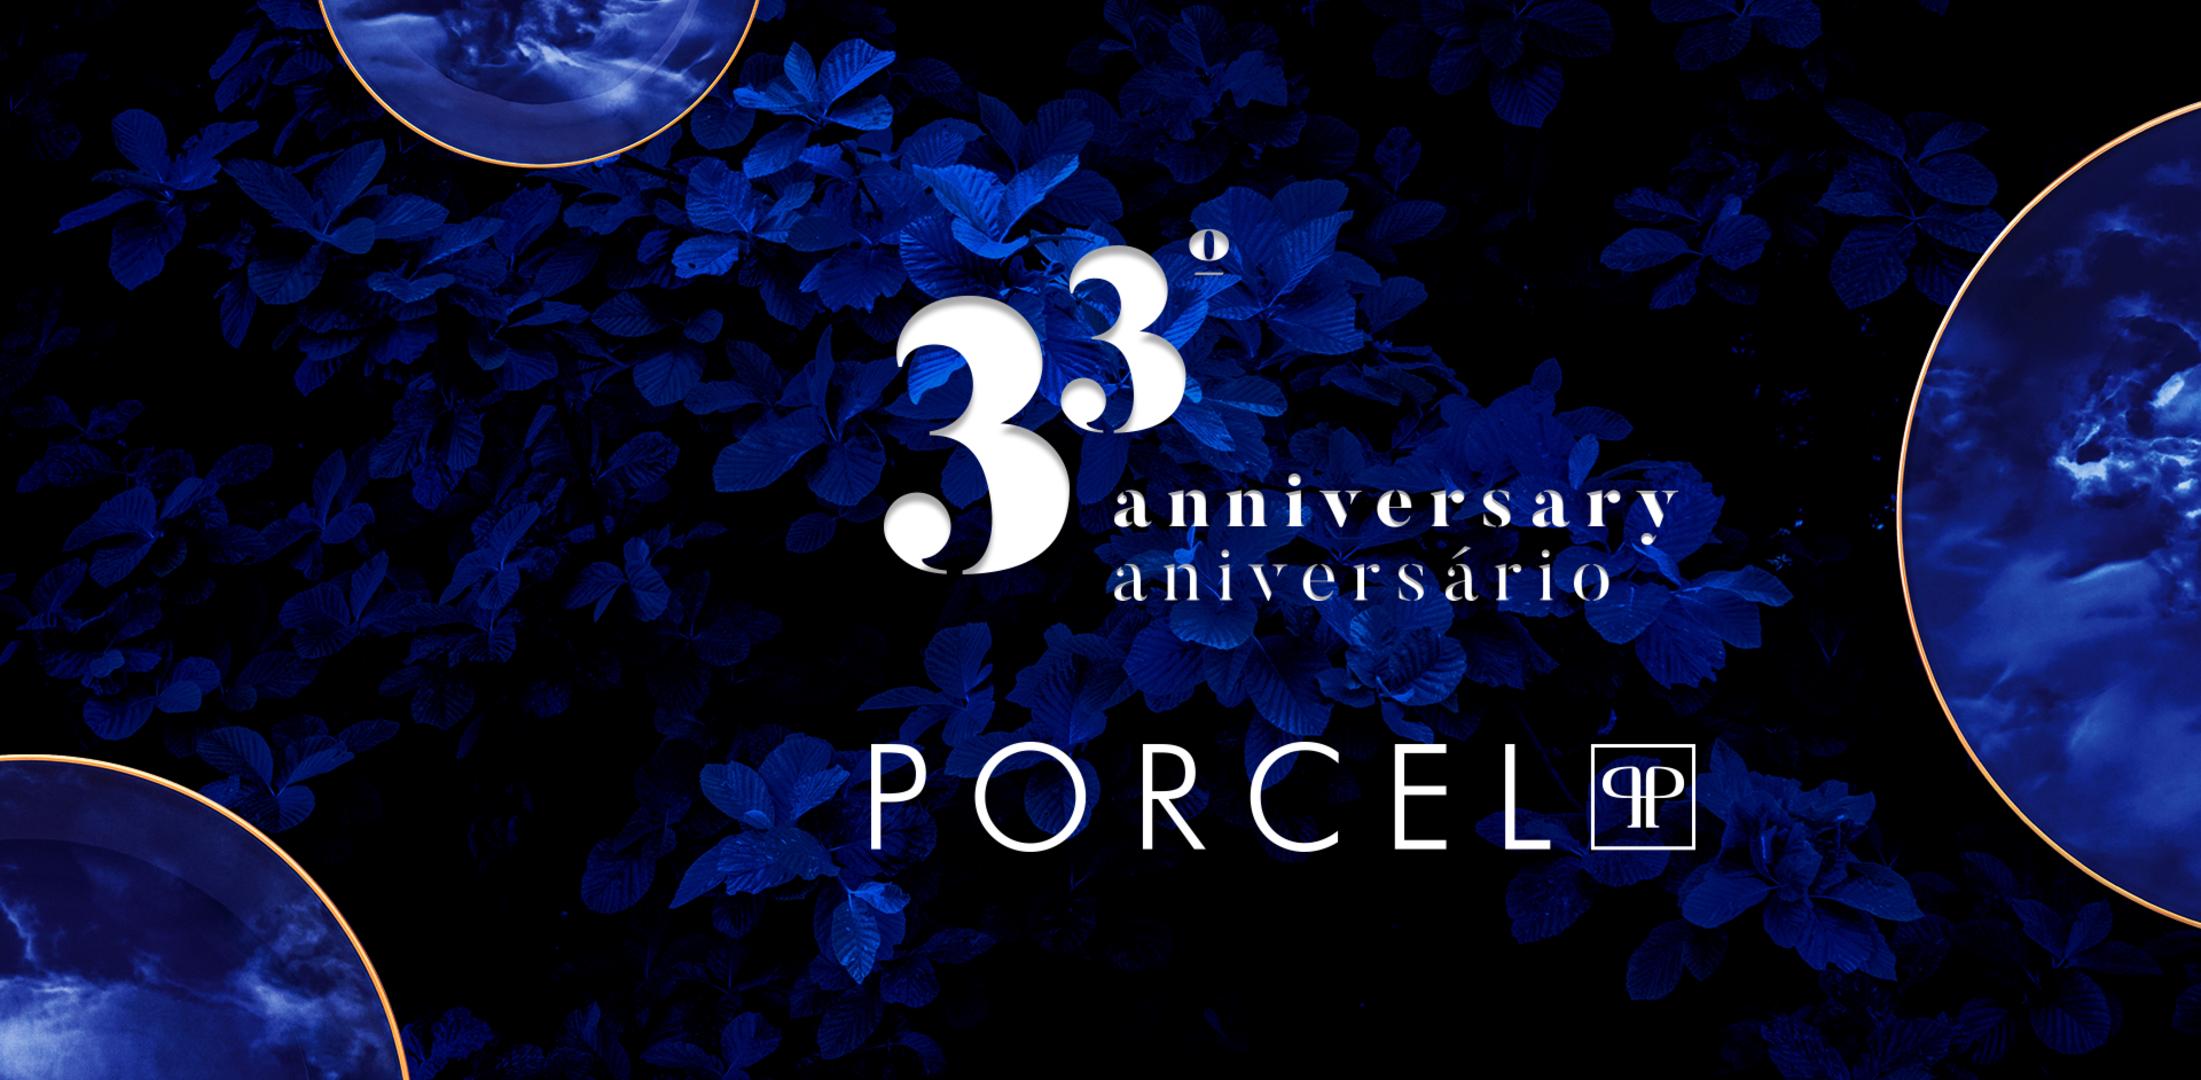 33 Aniversario 0